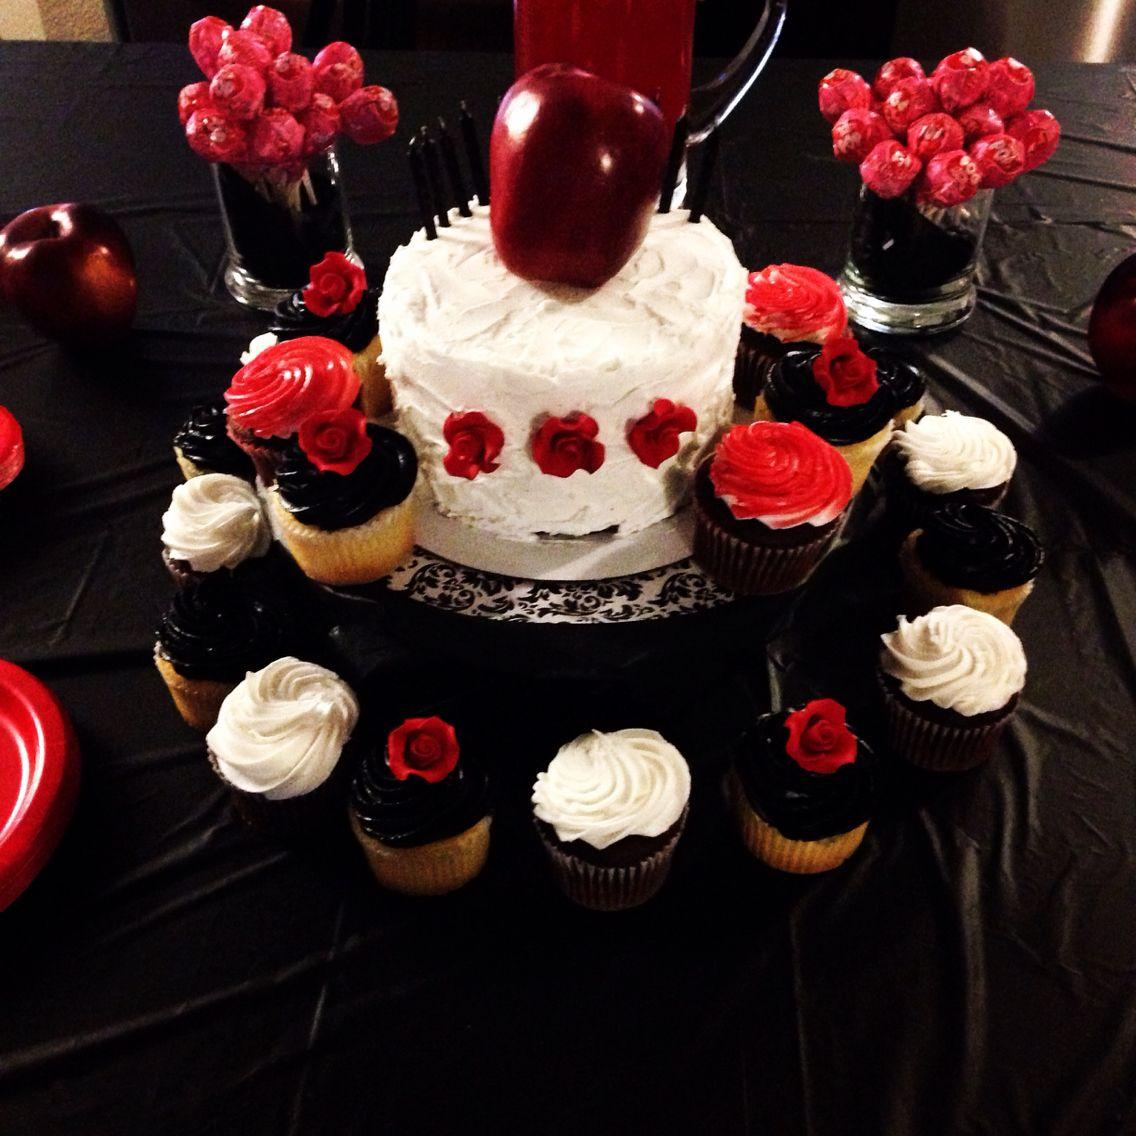 OUAT Evil Queen Birthday cake Regina Mills bday Pinterest